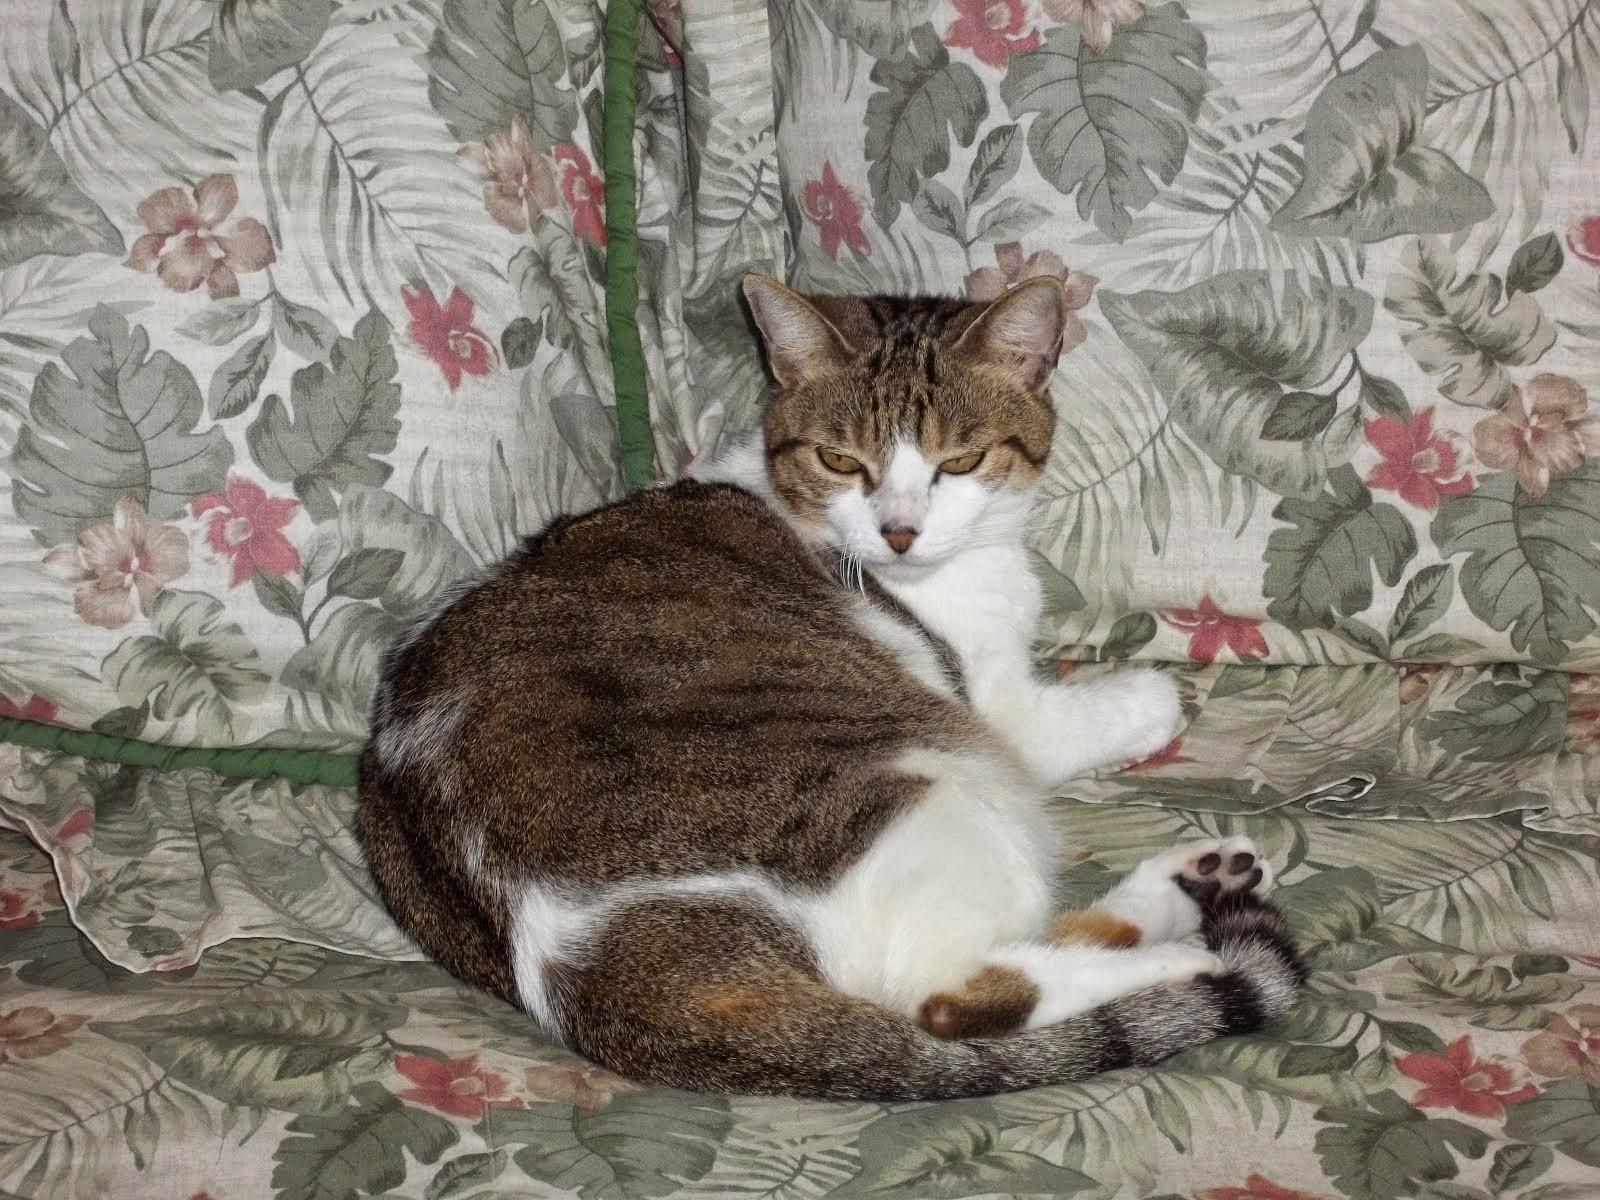 My Cat Missy